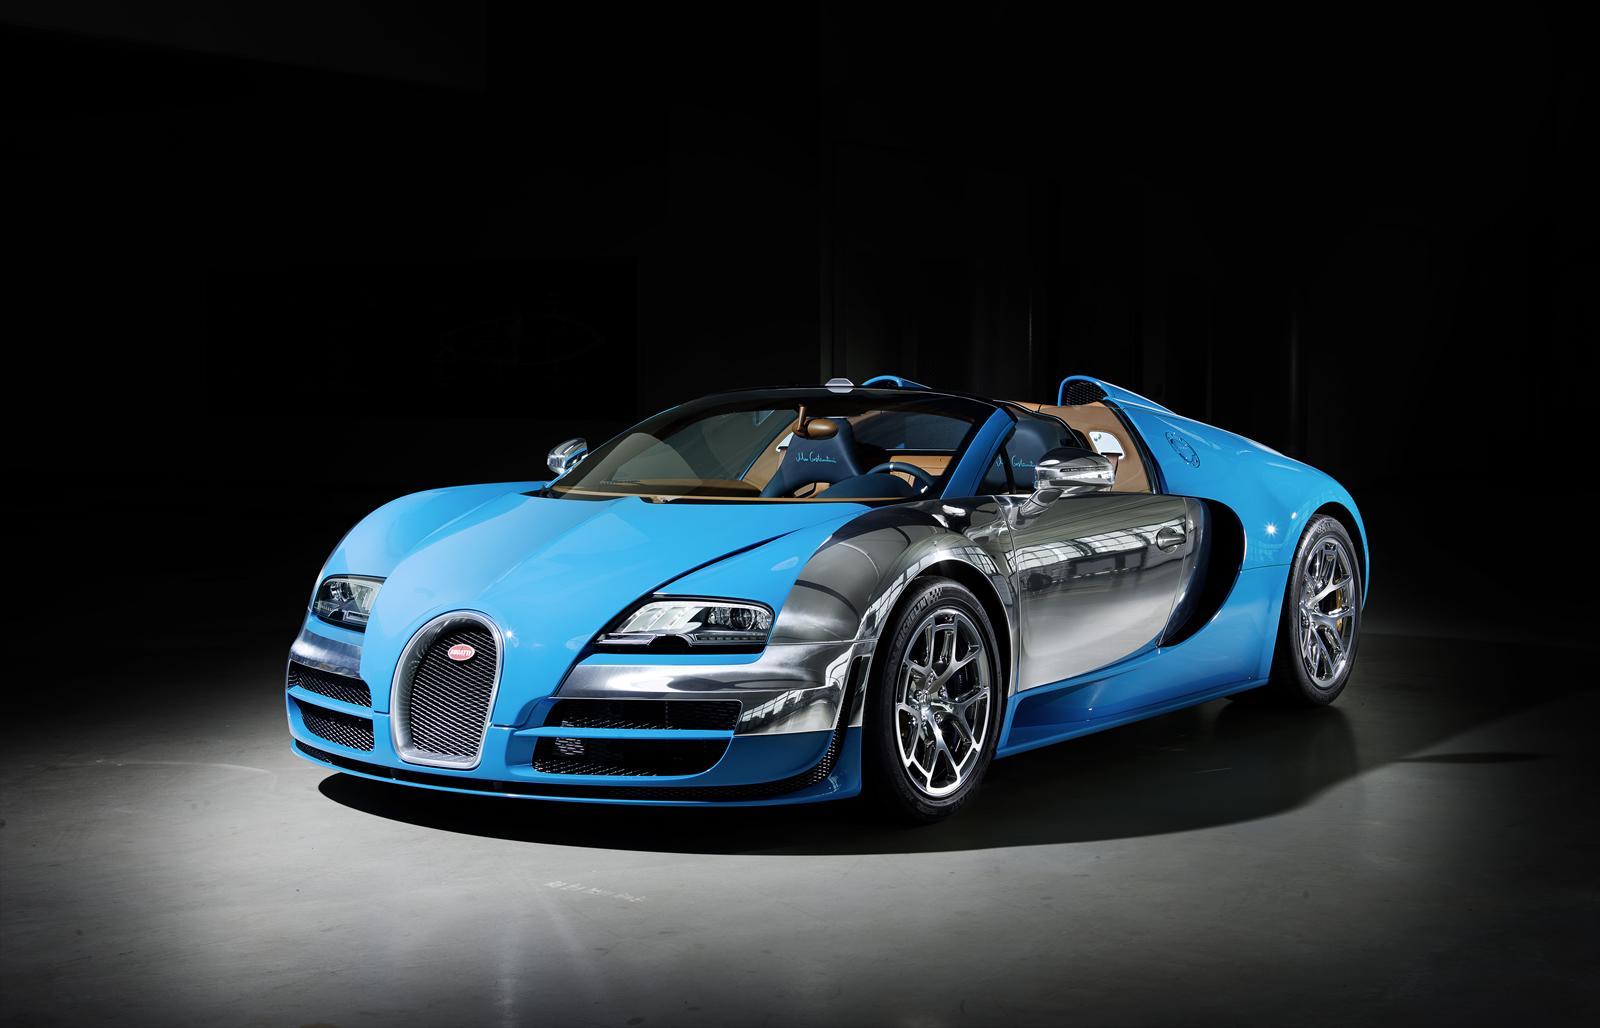 bugatti veyron configurator goes online - autoevolution